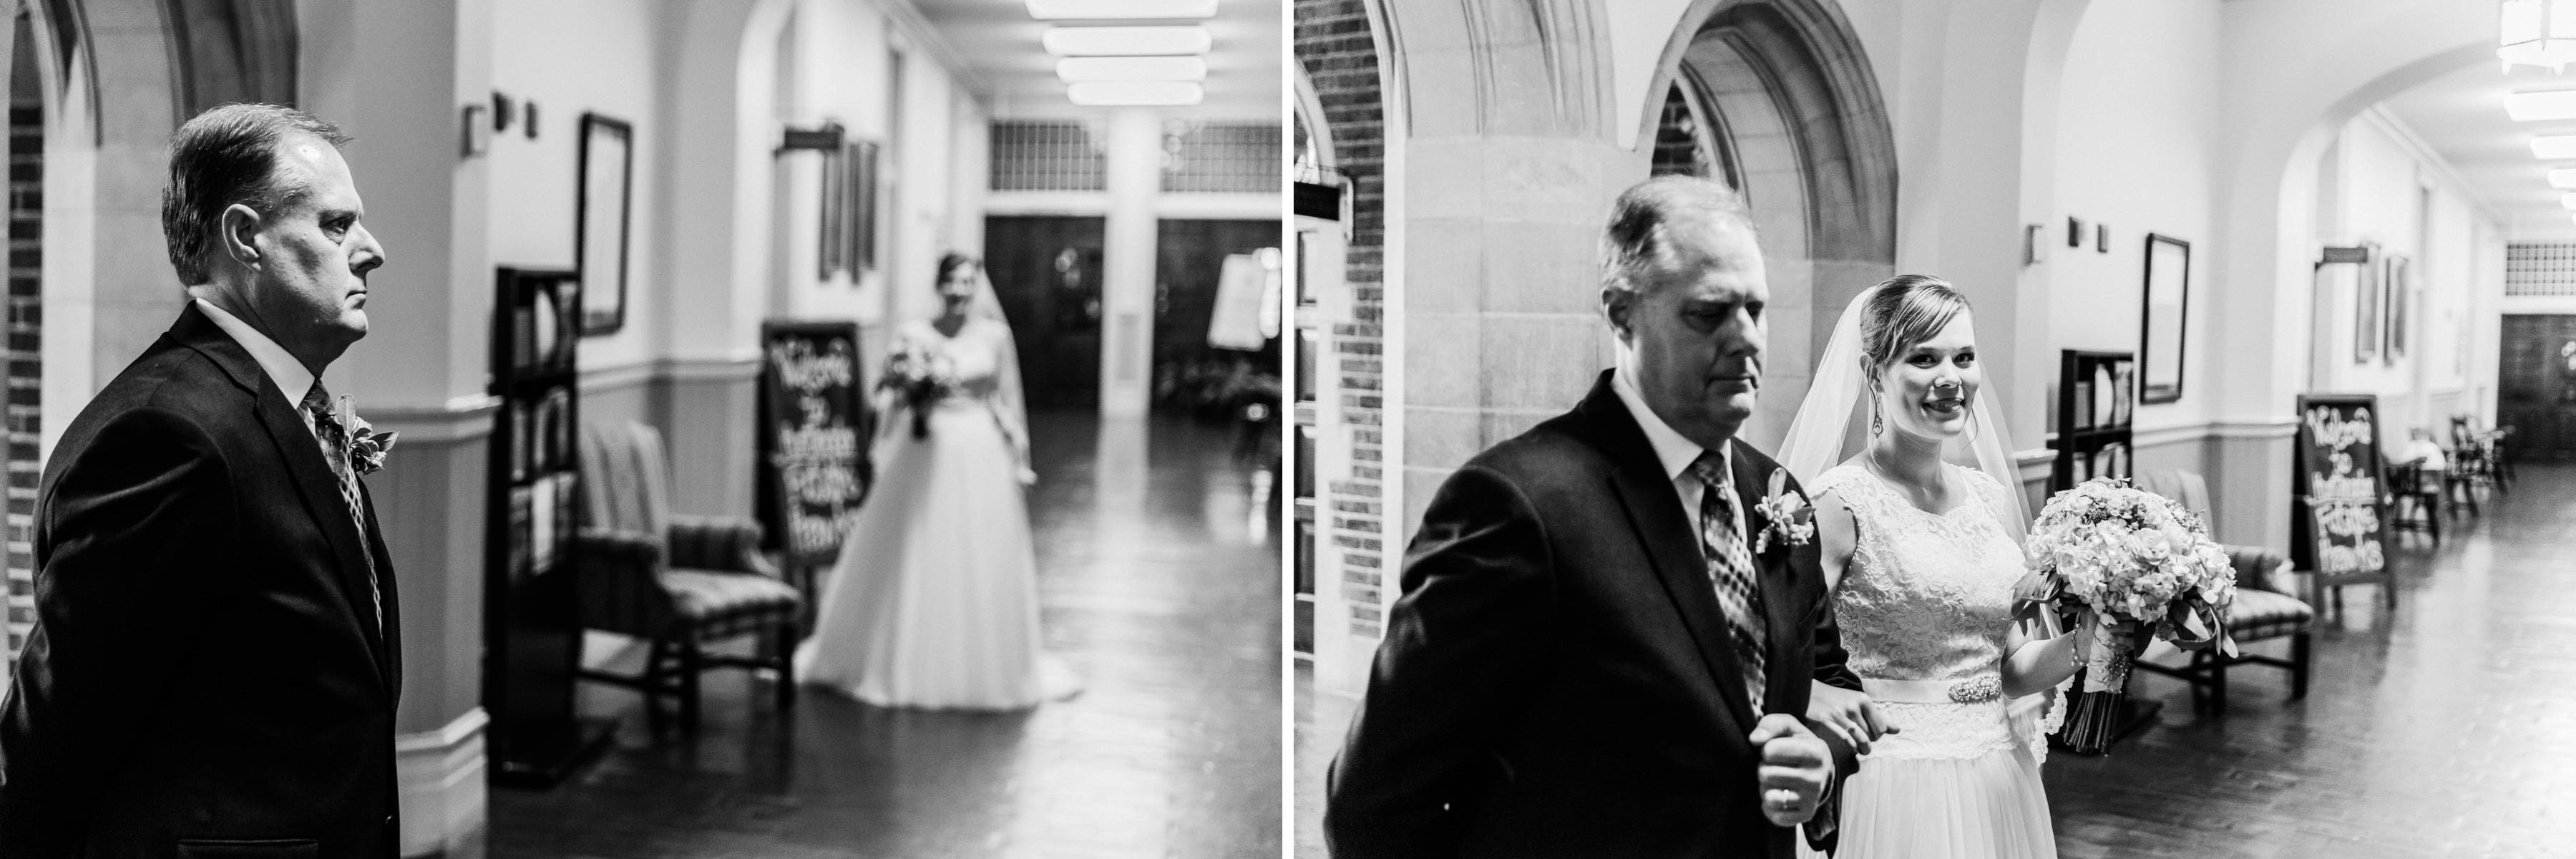 MAULDIN_WEDDING_MONTGOMERY_ALABAMA_WEDDING_PHOTOGRAPHY_57